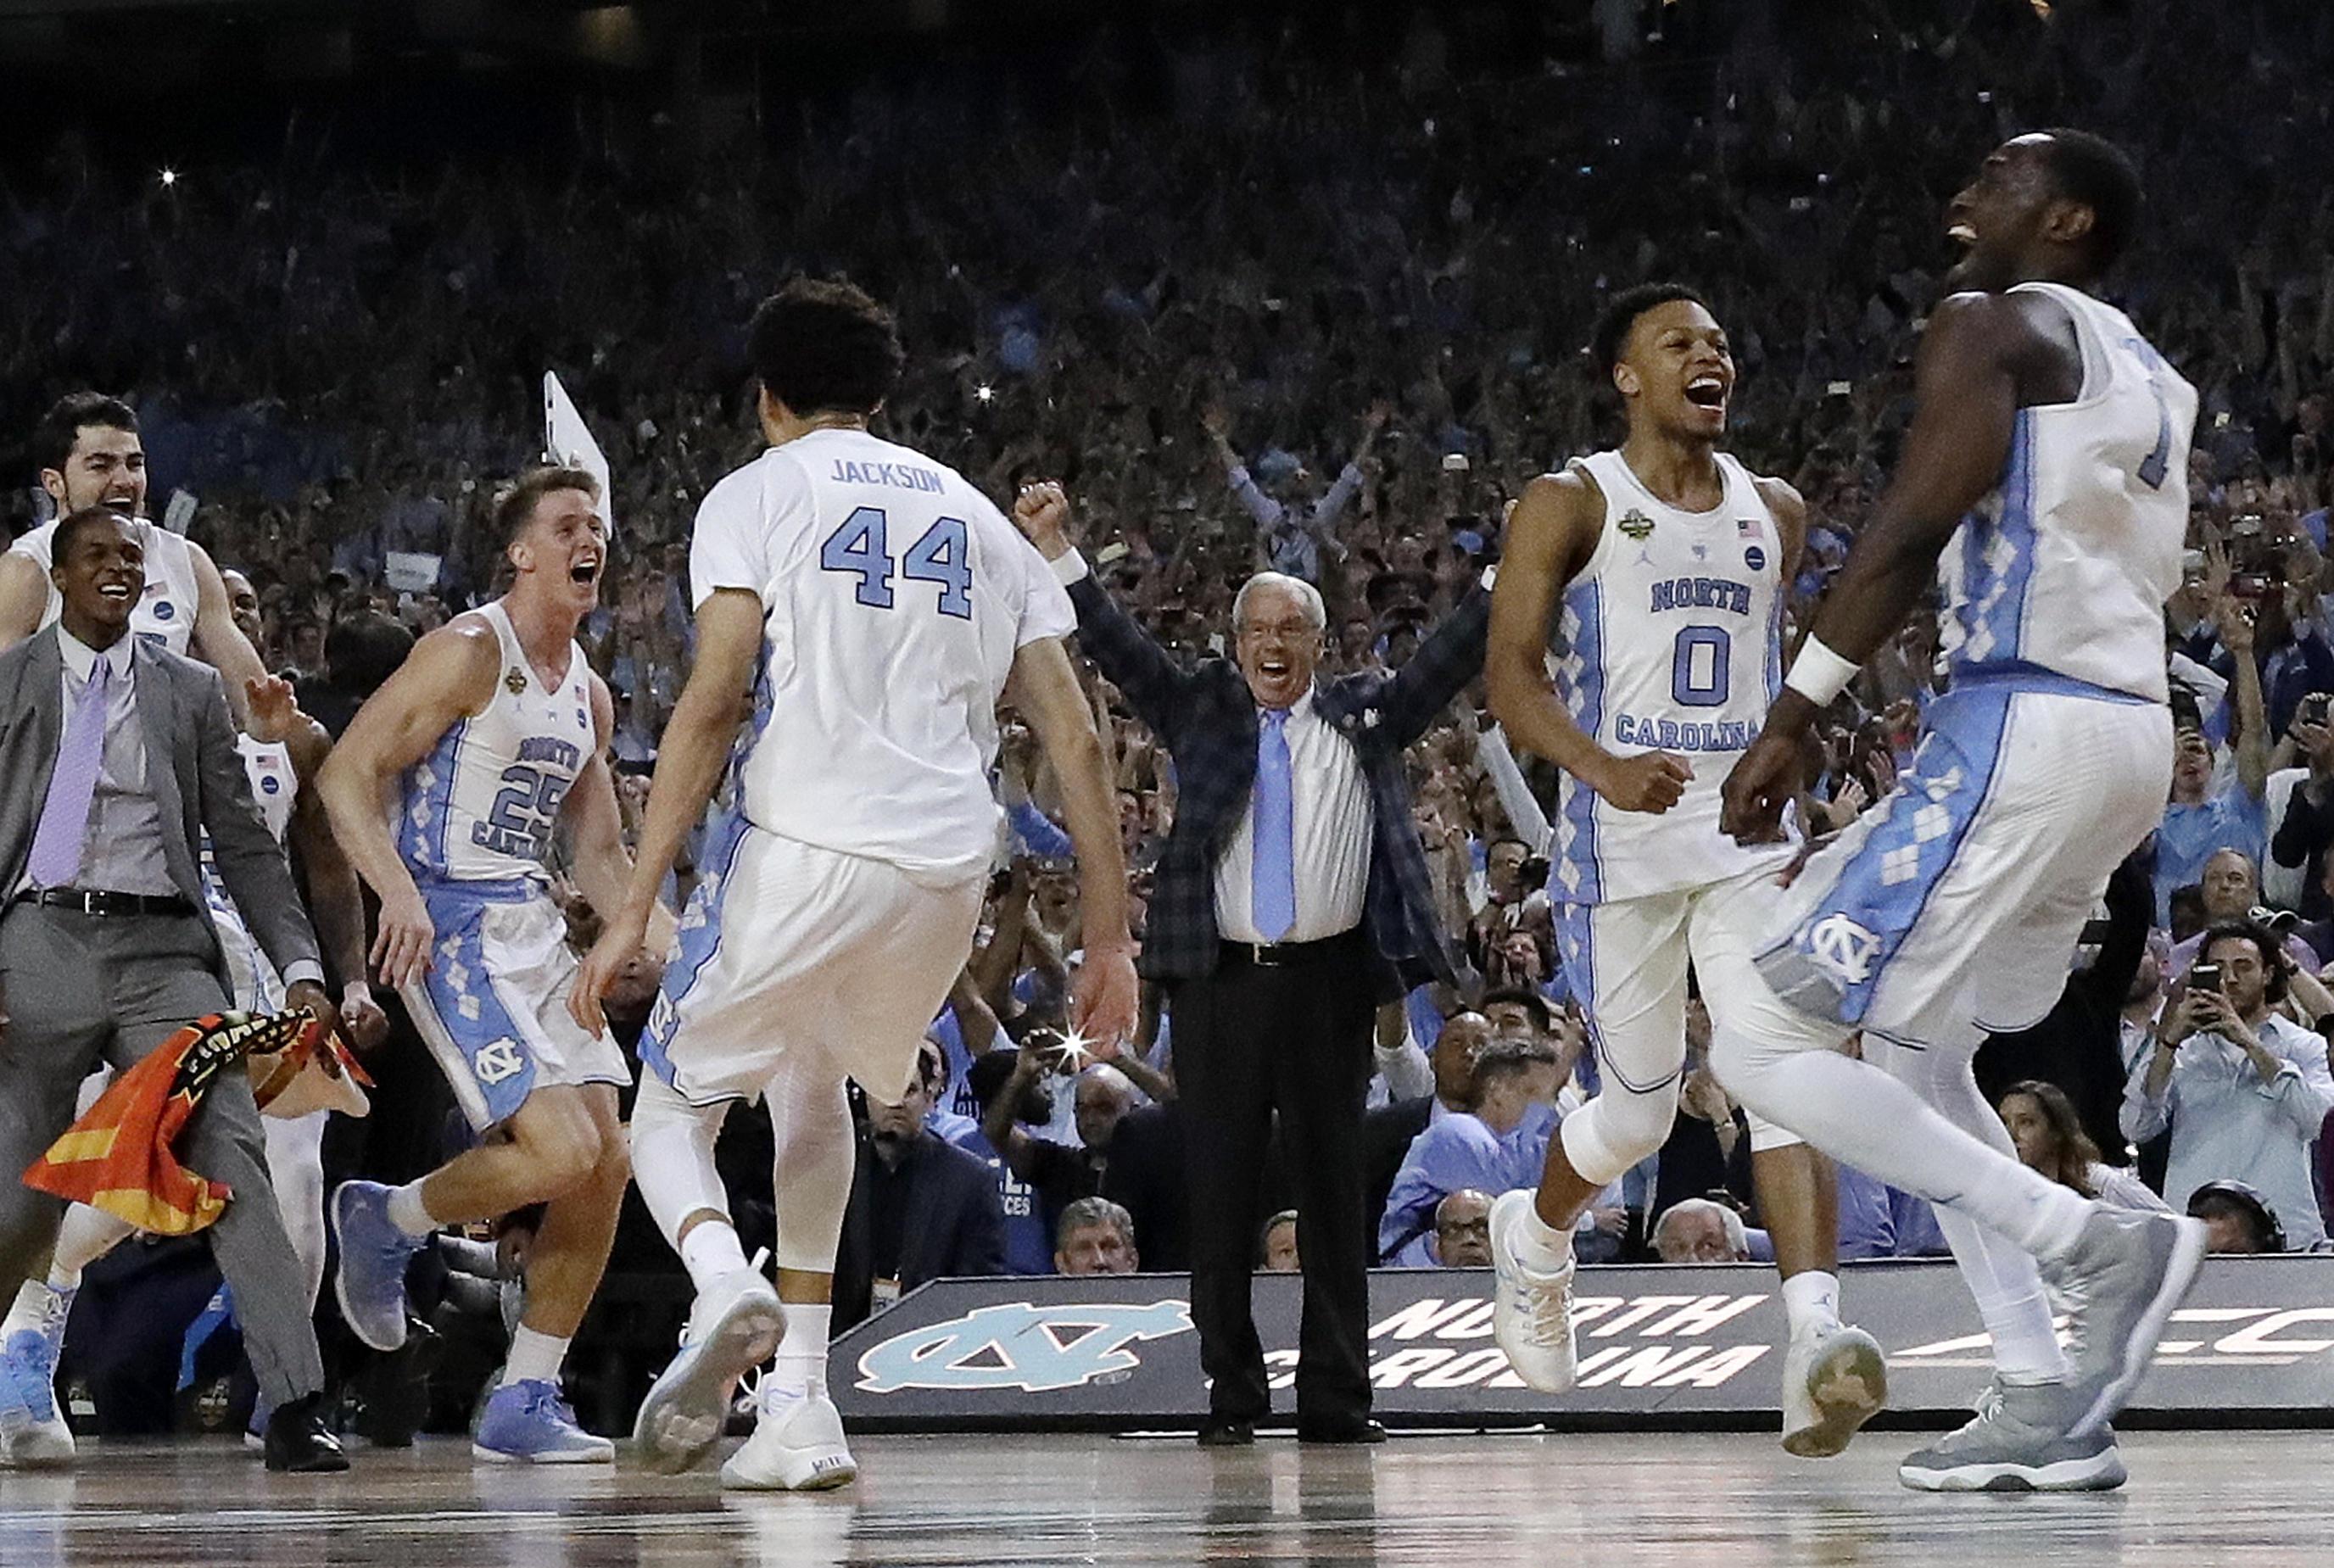 North Carolina grabs 6th NCAA championship with 71-65 win ...